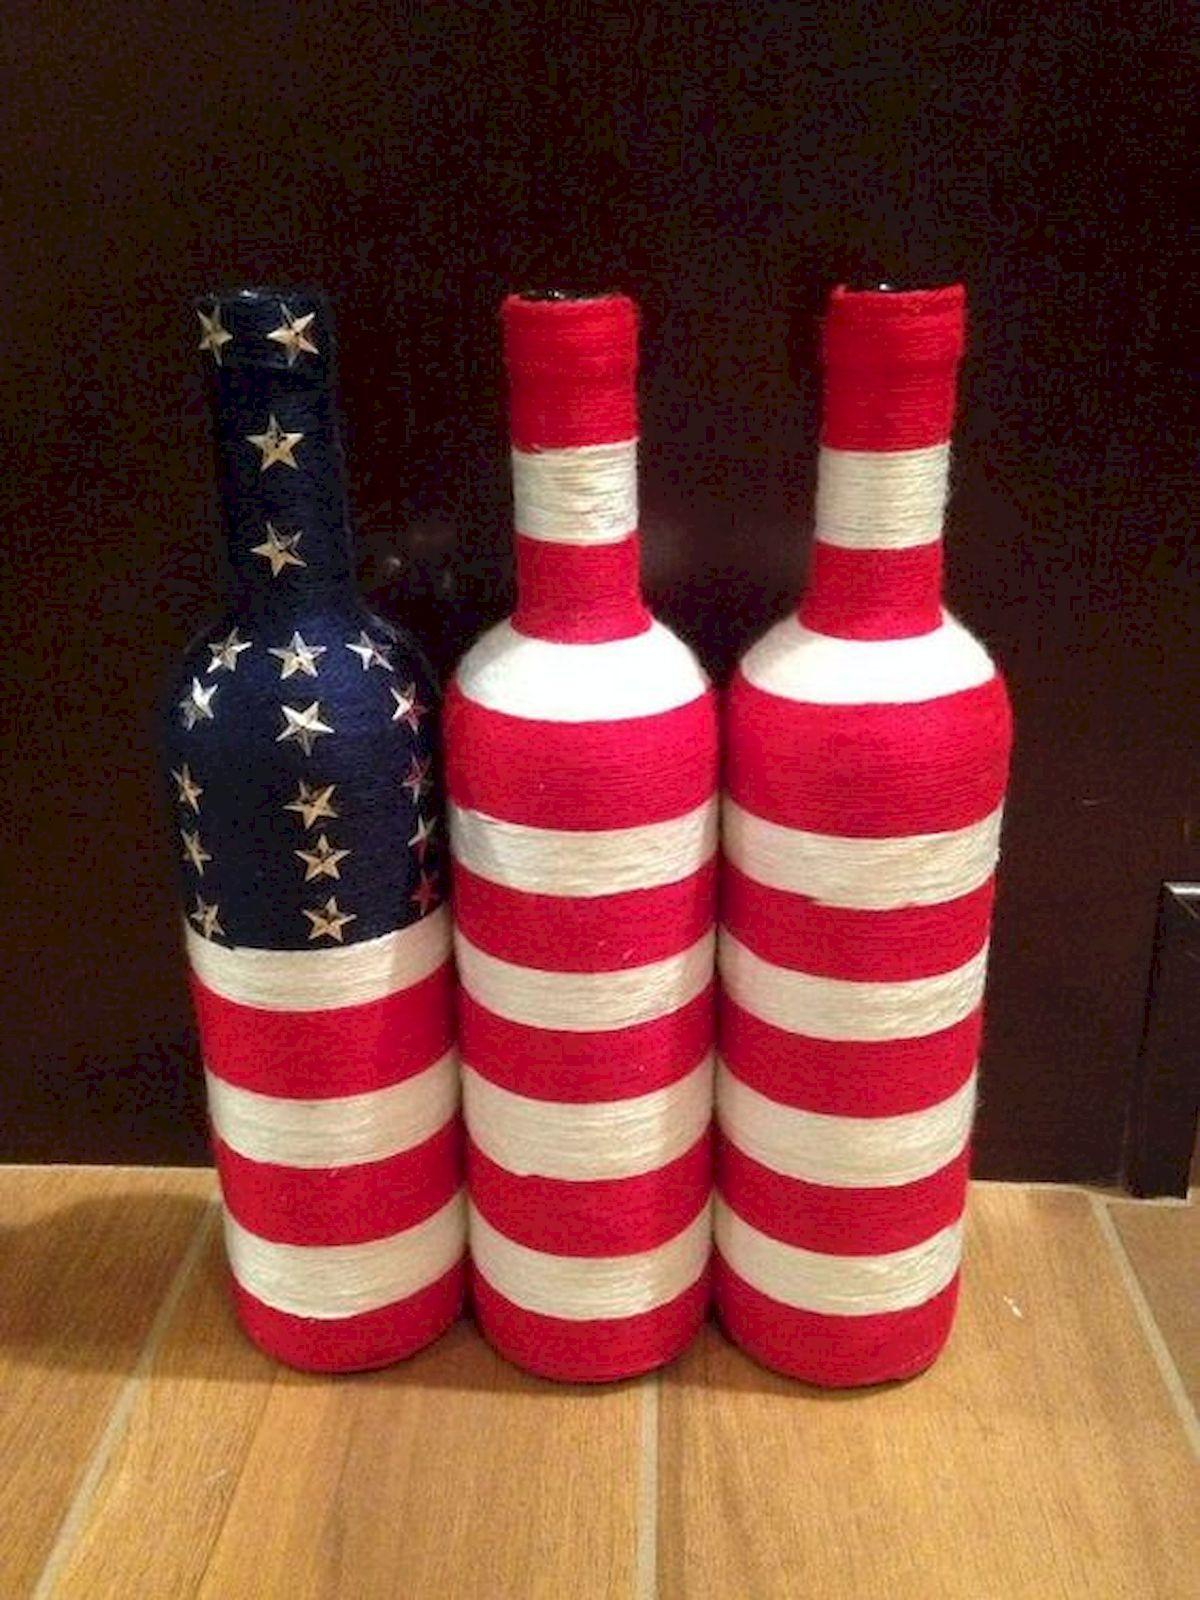 80 Diy America Independence Day Decor Ideas And Design Http Prohomedecor Info 80 Diy America Indep Wrapped Wine Bottles Wine Bottle Crafts Beer Bottle Crafts